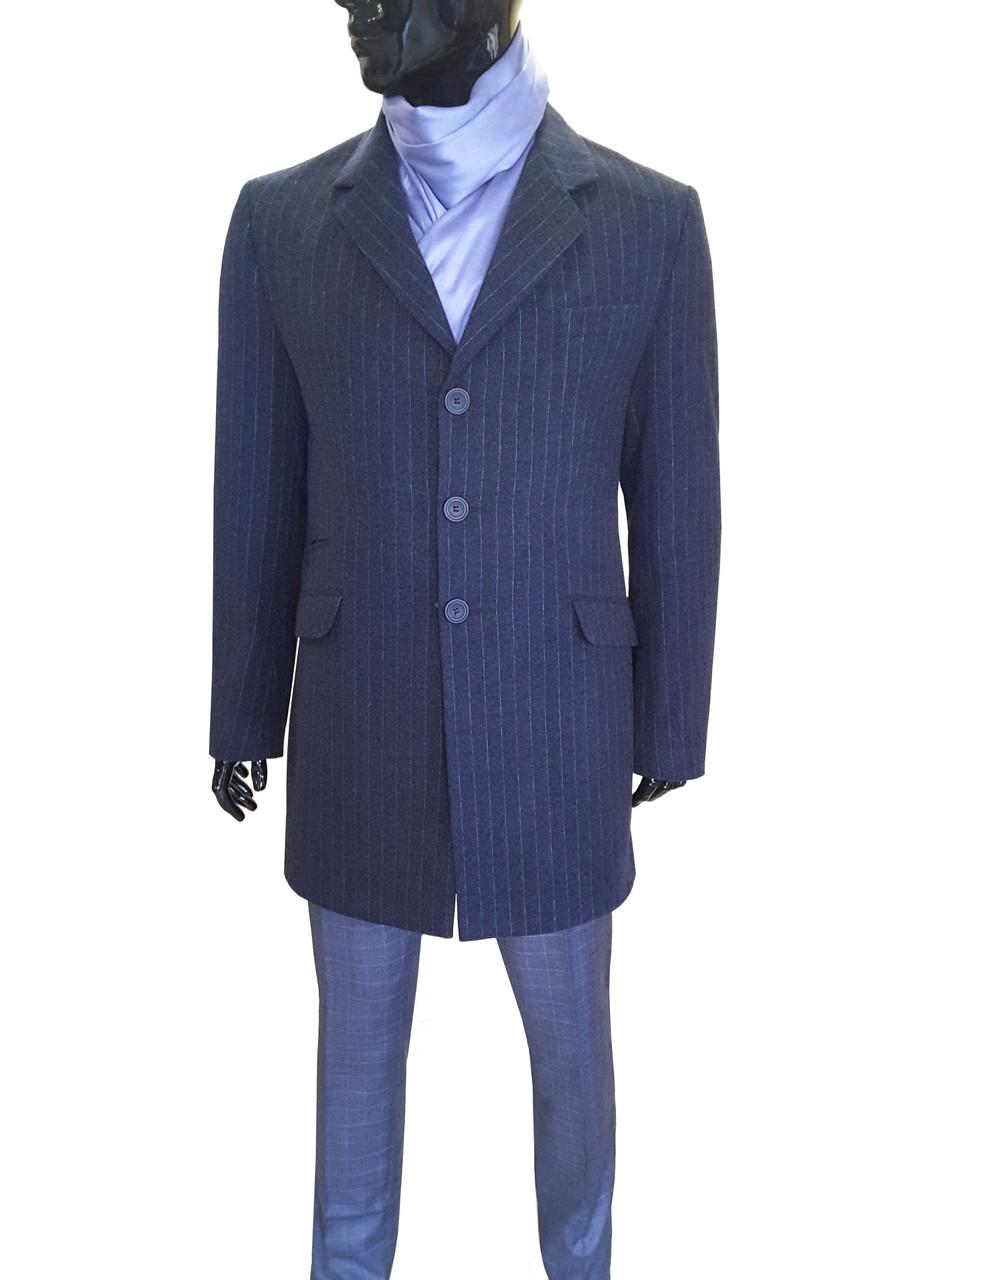 Пальто темно-синее зима- JSP 24105/2